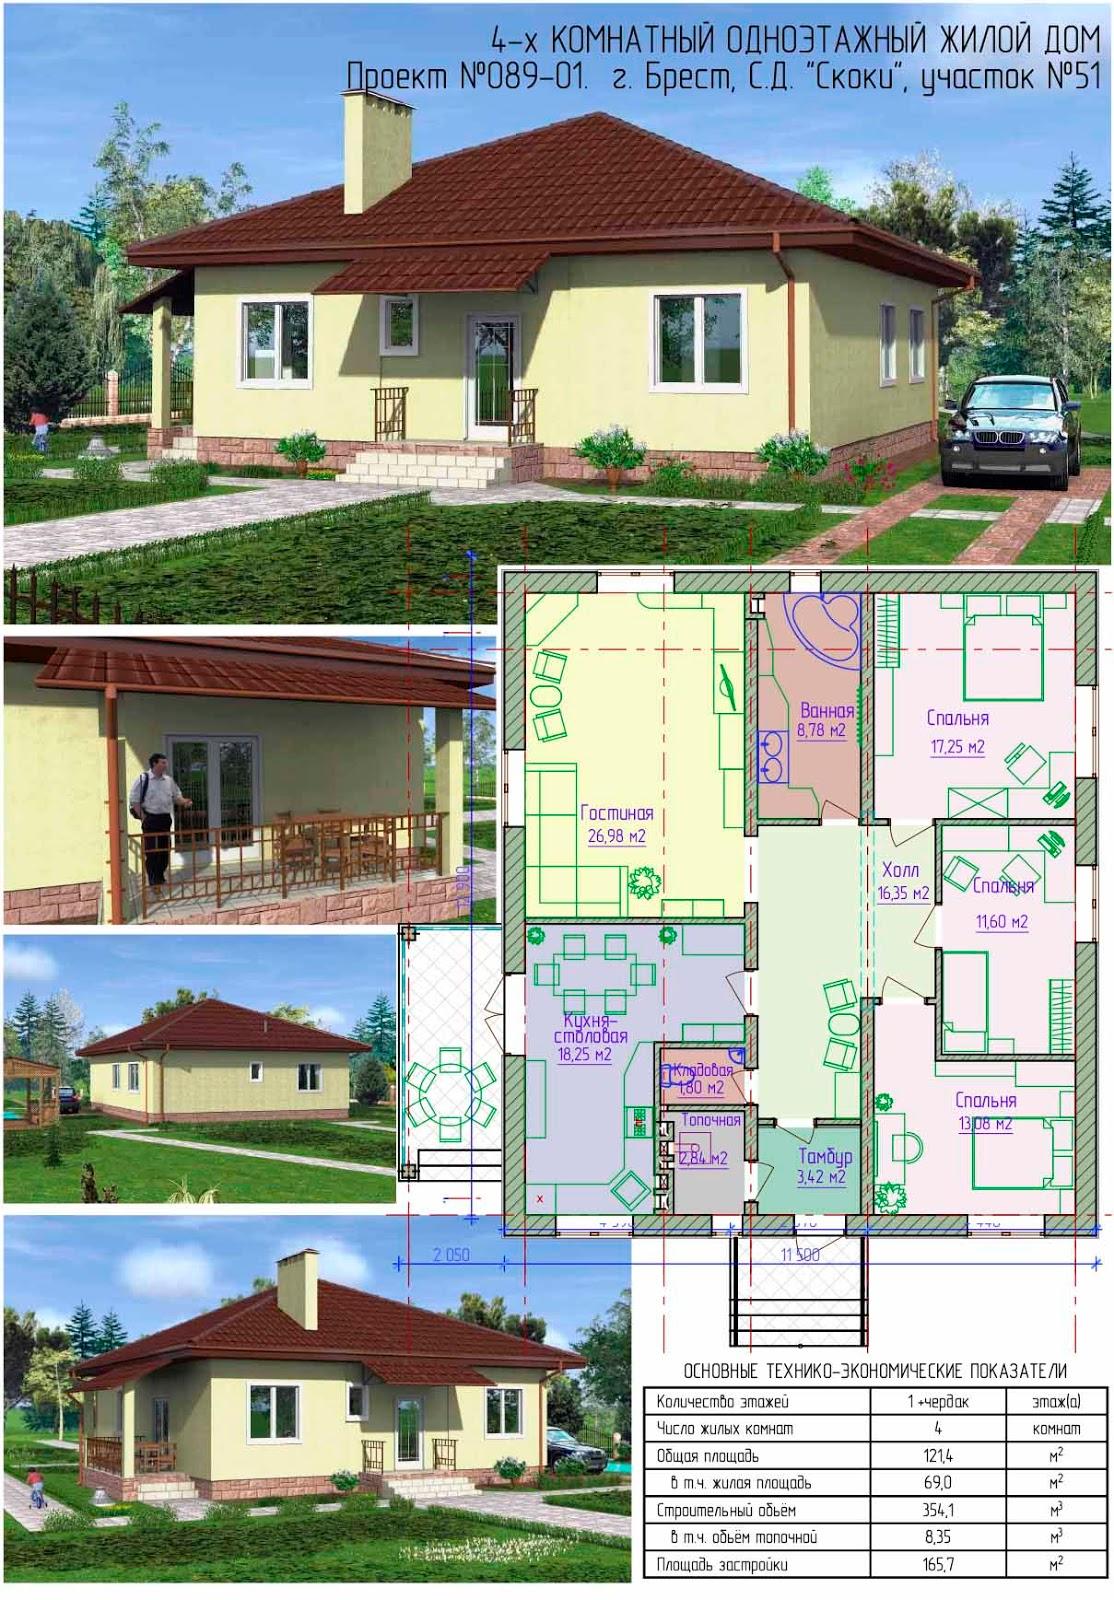 Проект 5-ти комнатного дома | Дизайн и архитектура